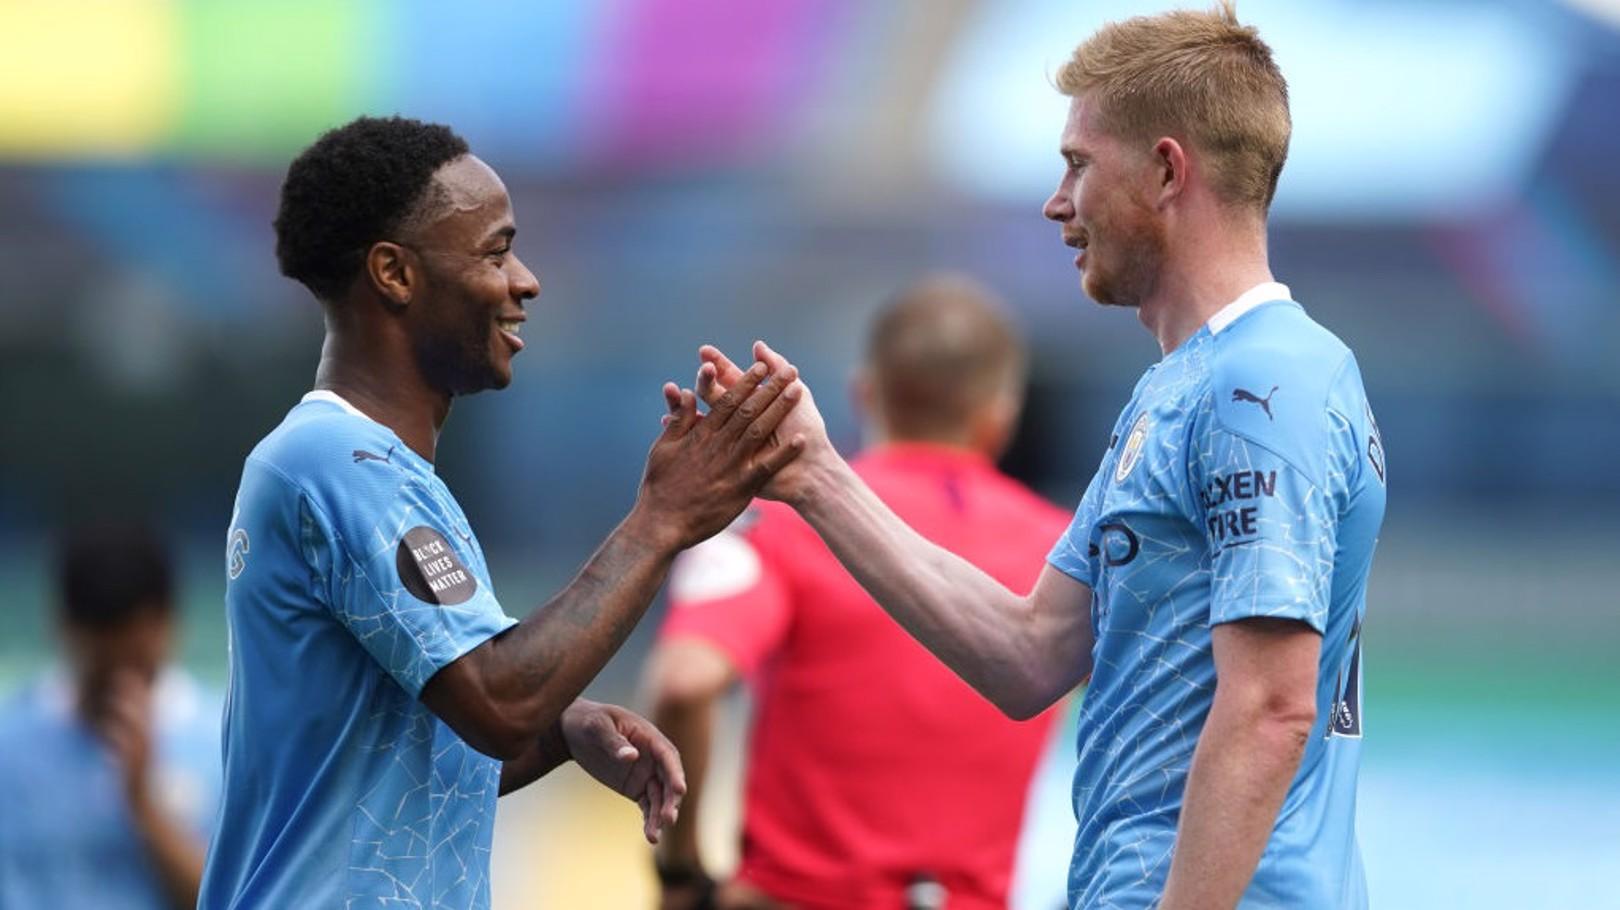 De Bruyne et Sterling nominés pour le PFA Player of the Year award